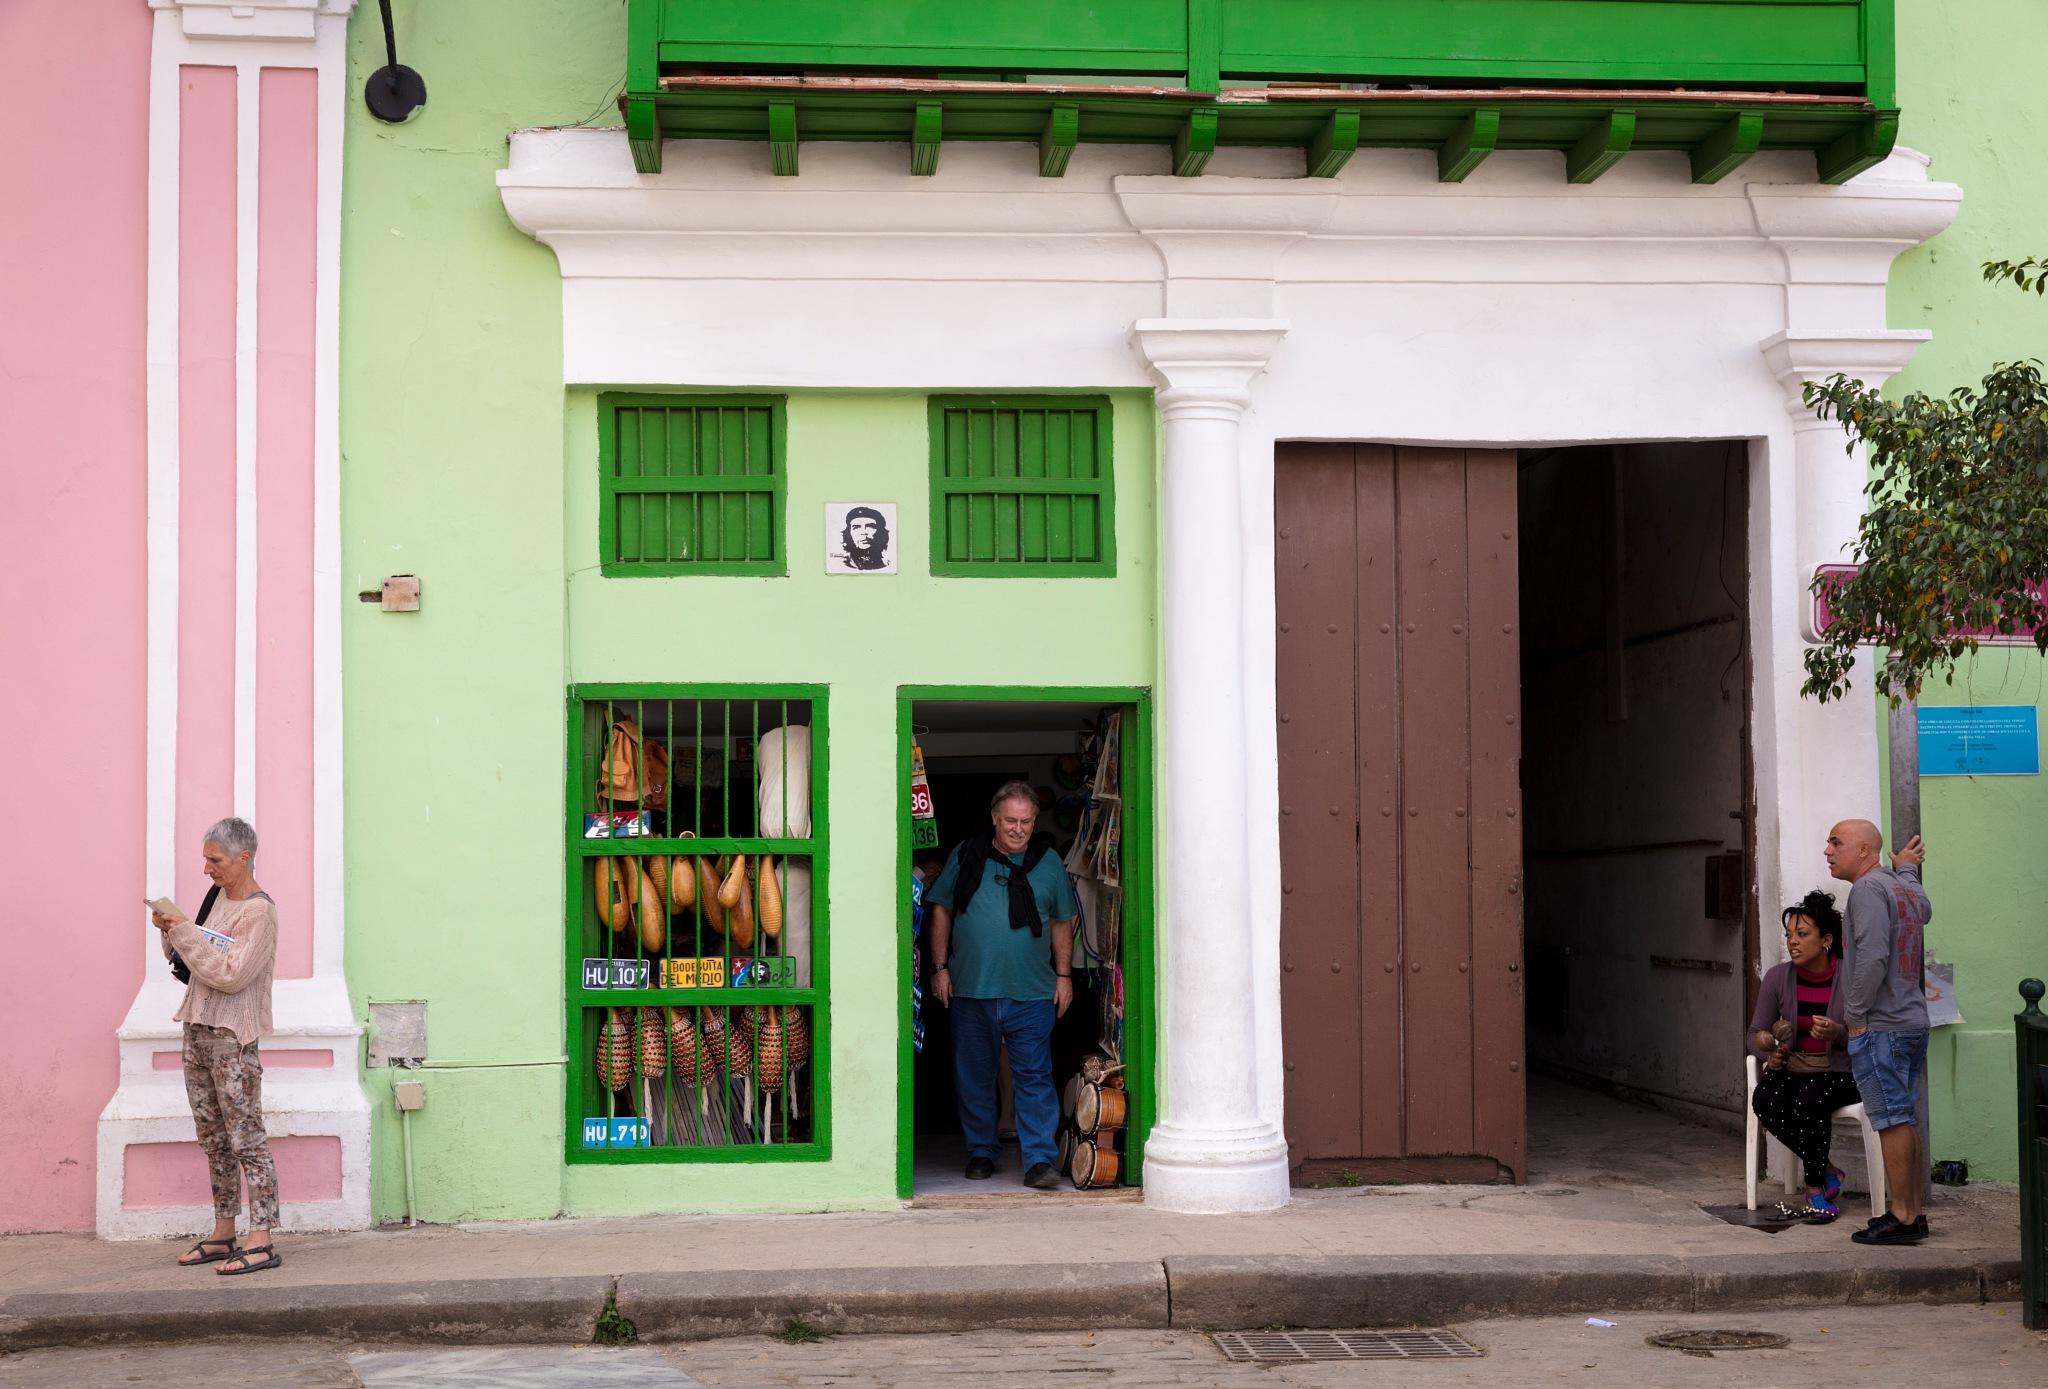 Havana Shopping by kpharney